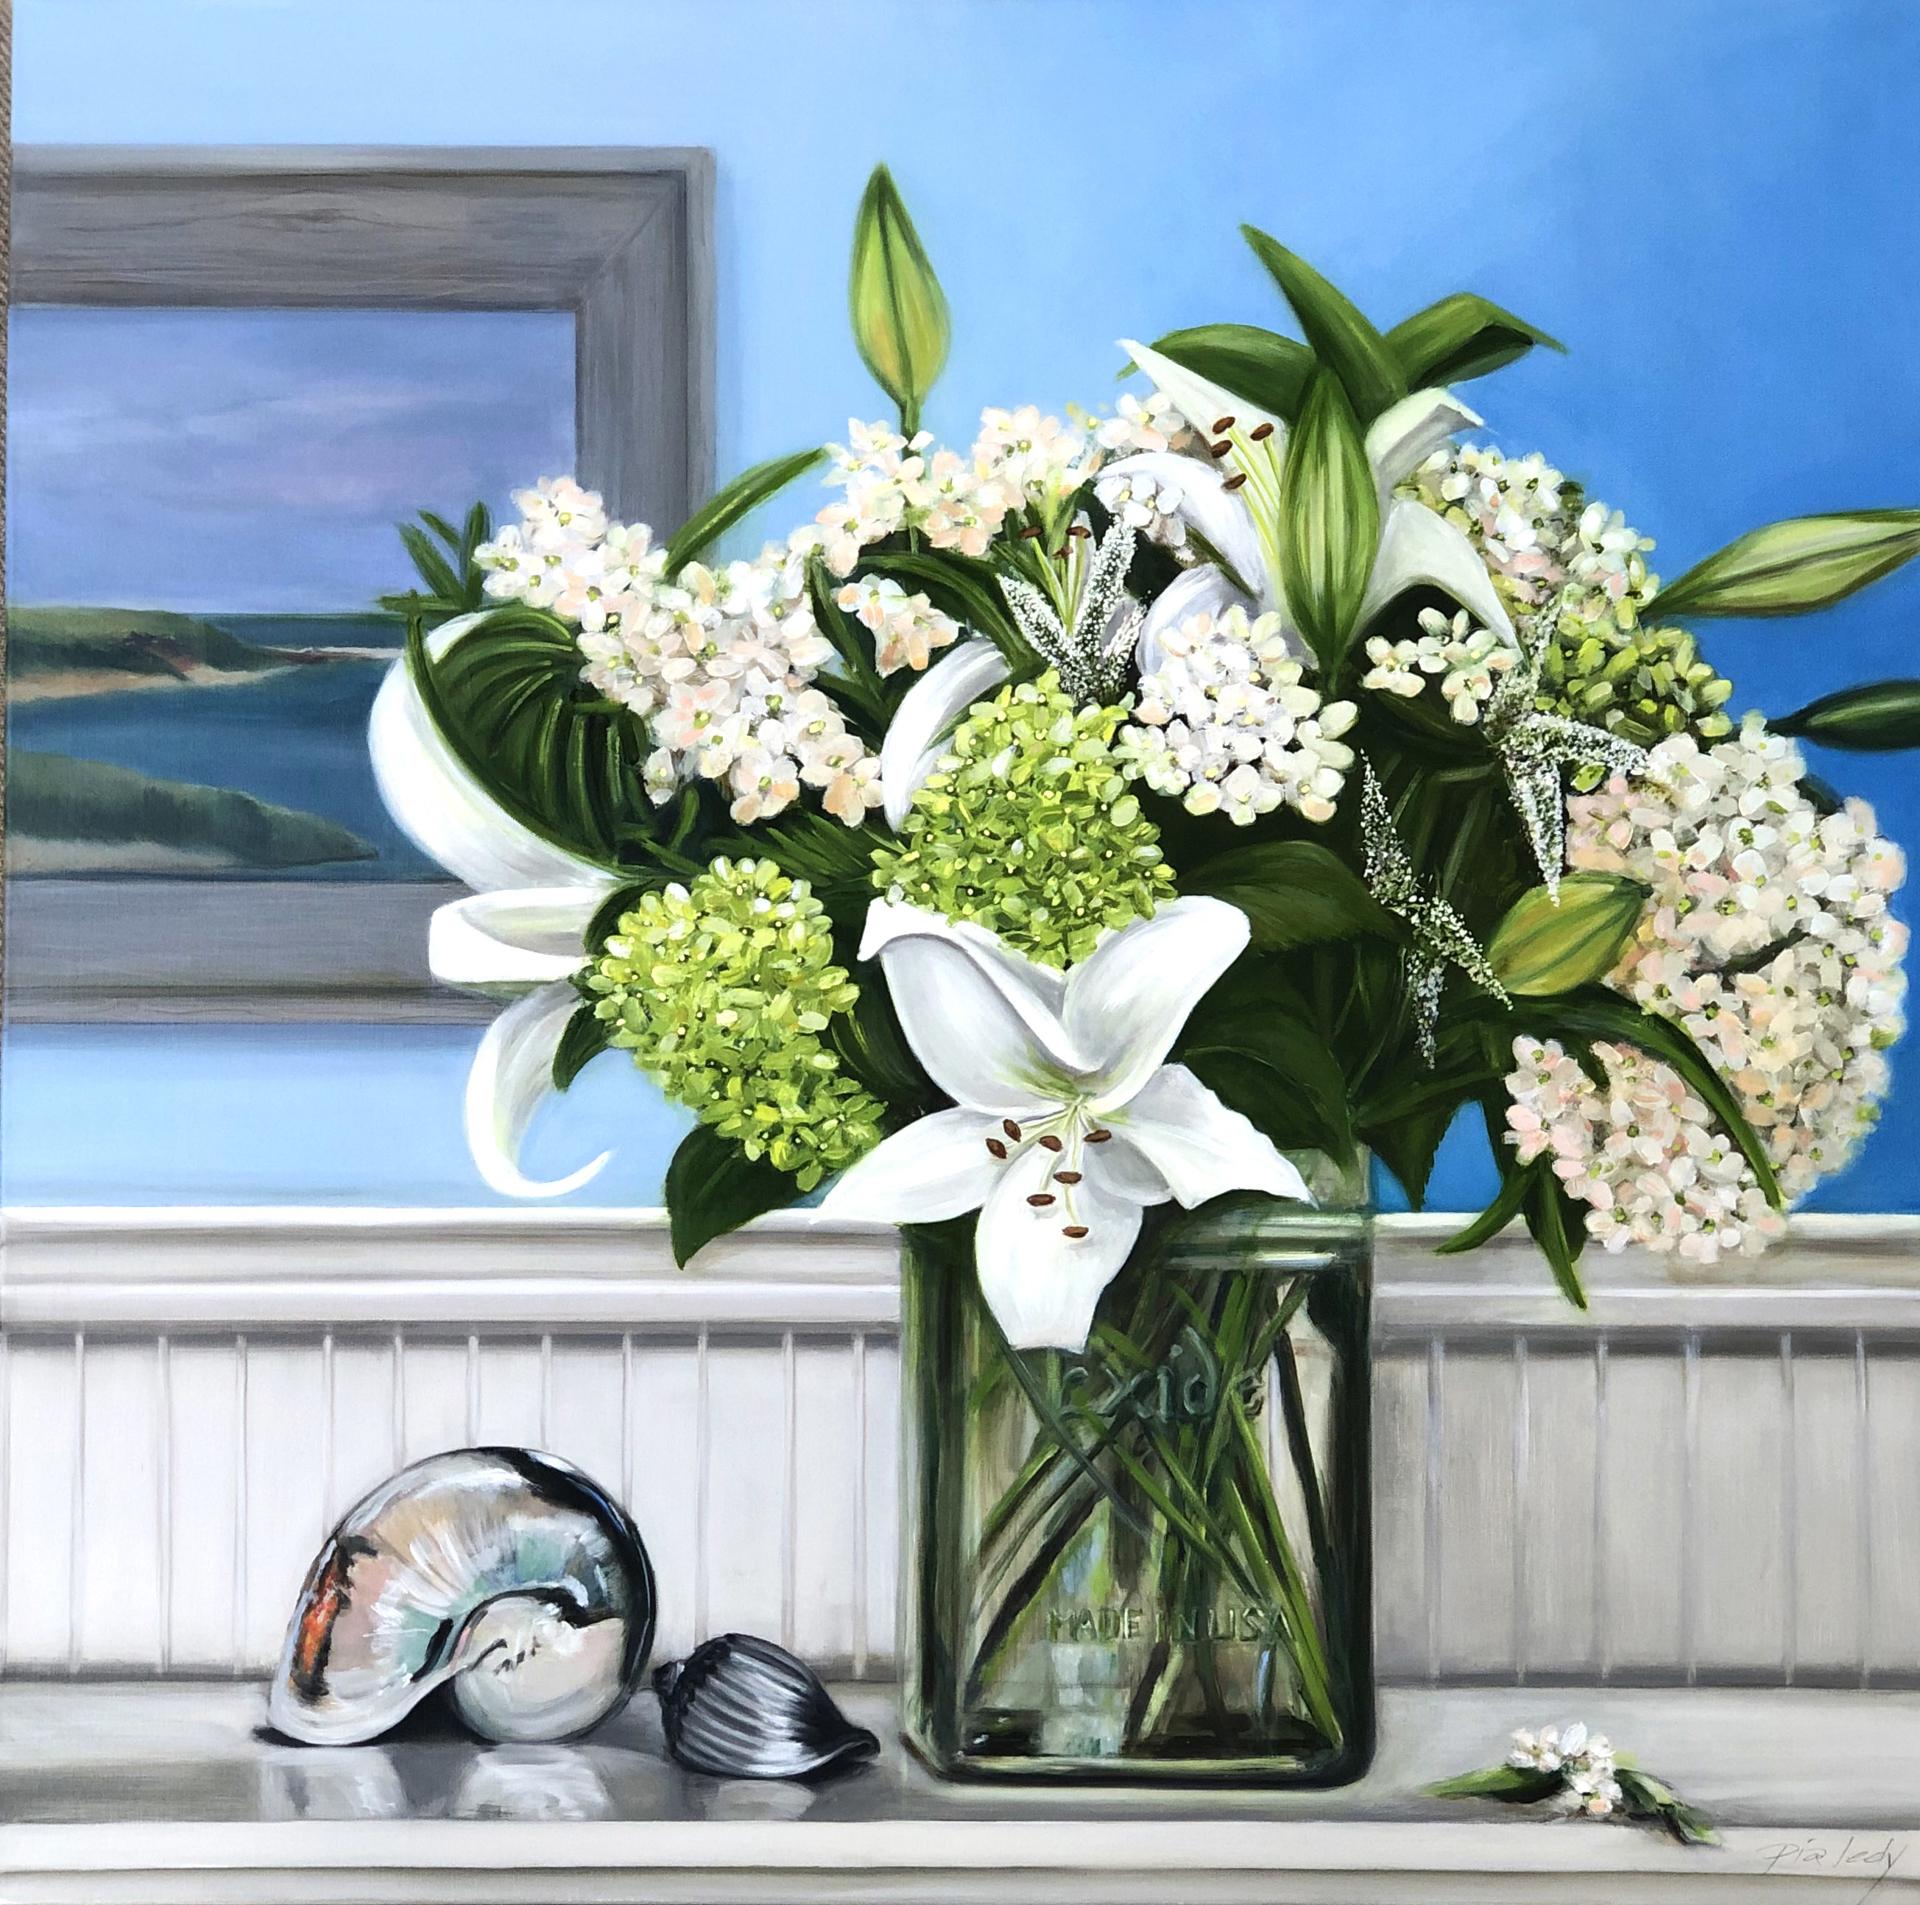 Lilies & Hydrangea by Pia Ledy